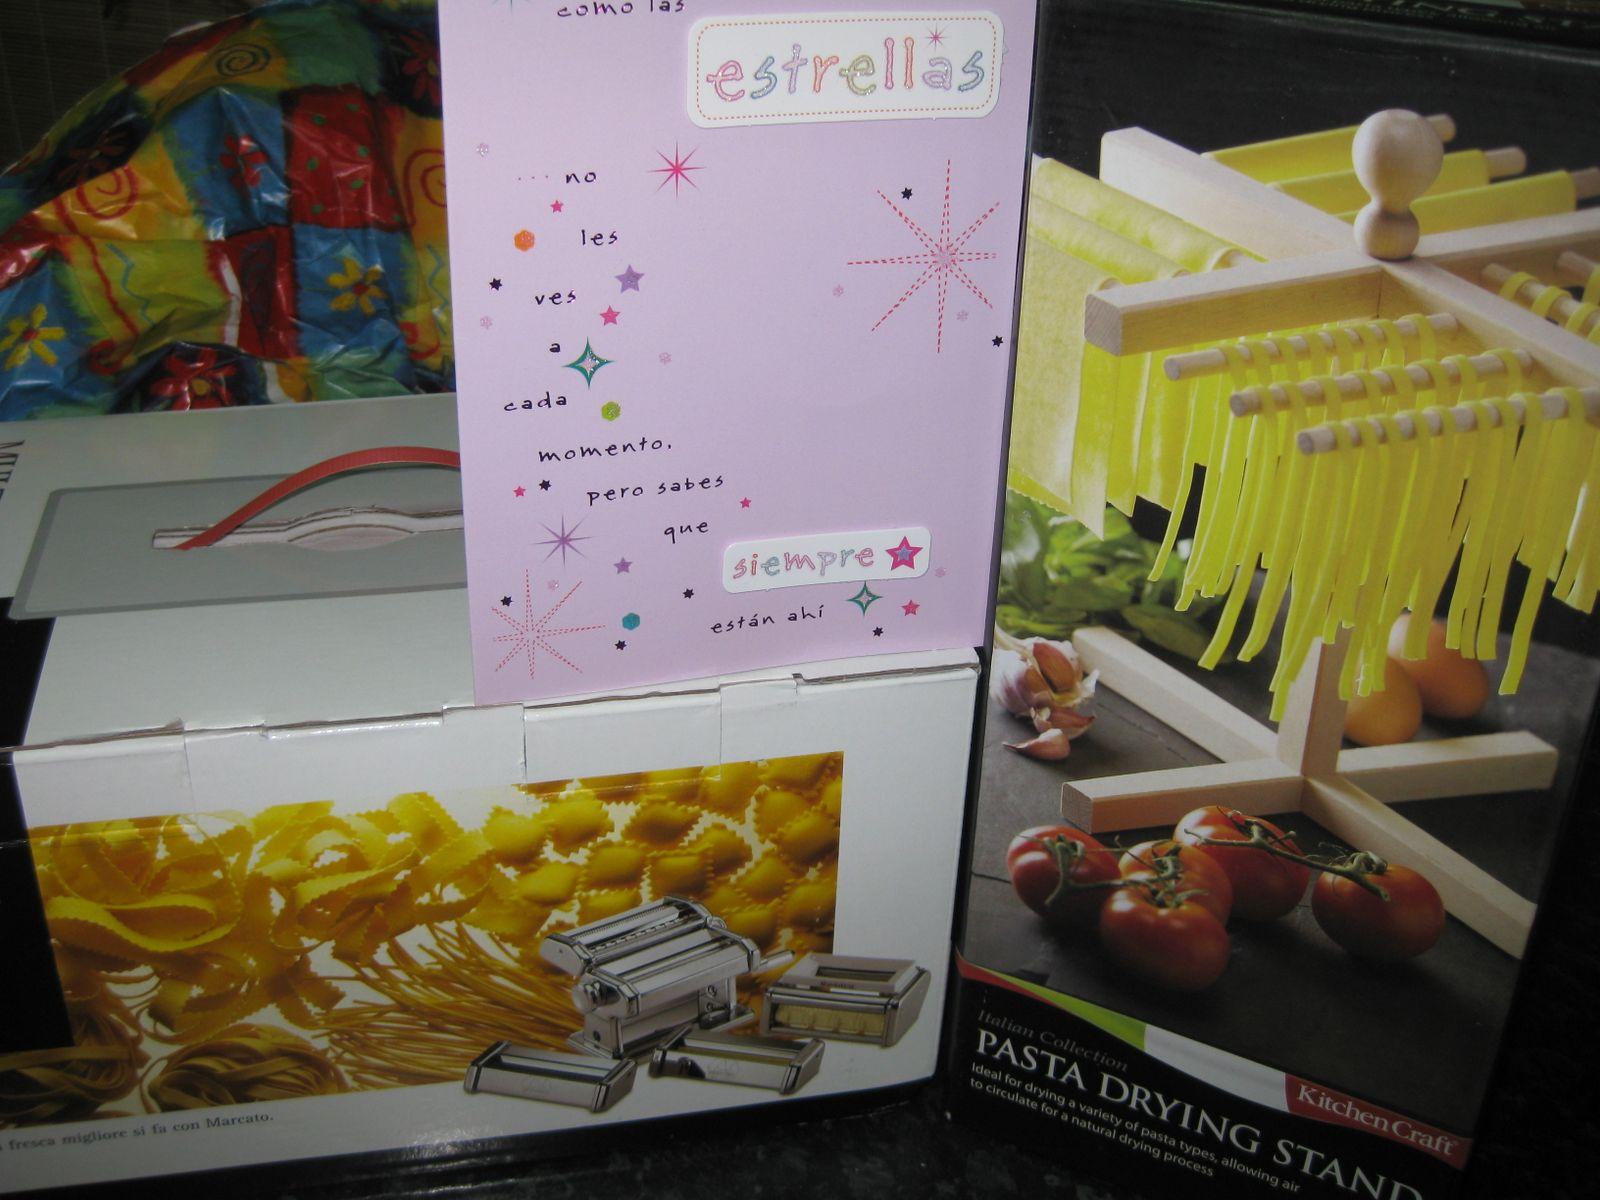 El chef coli la fabrica de pasta o el pasta nova - Bricomania sevilla ...